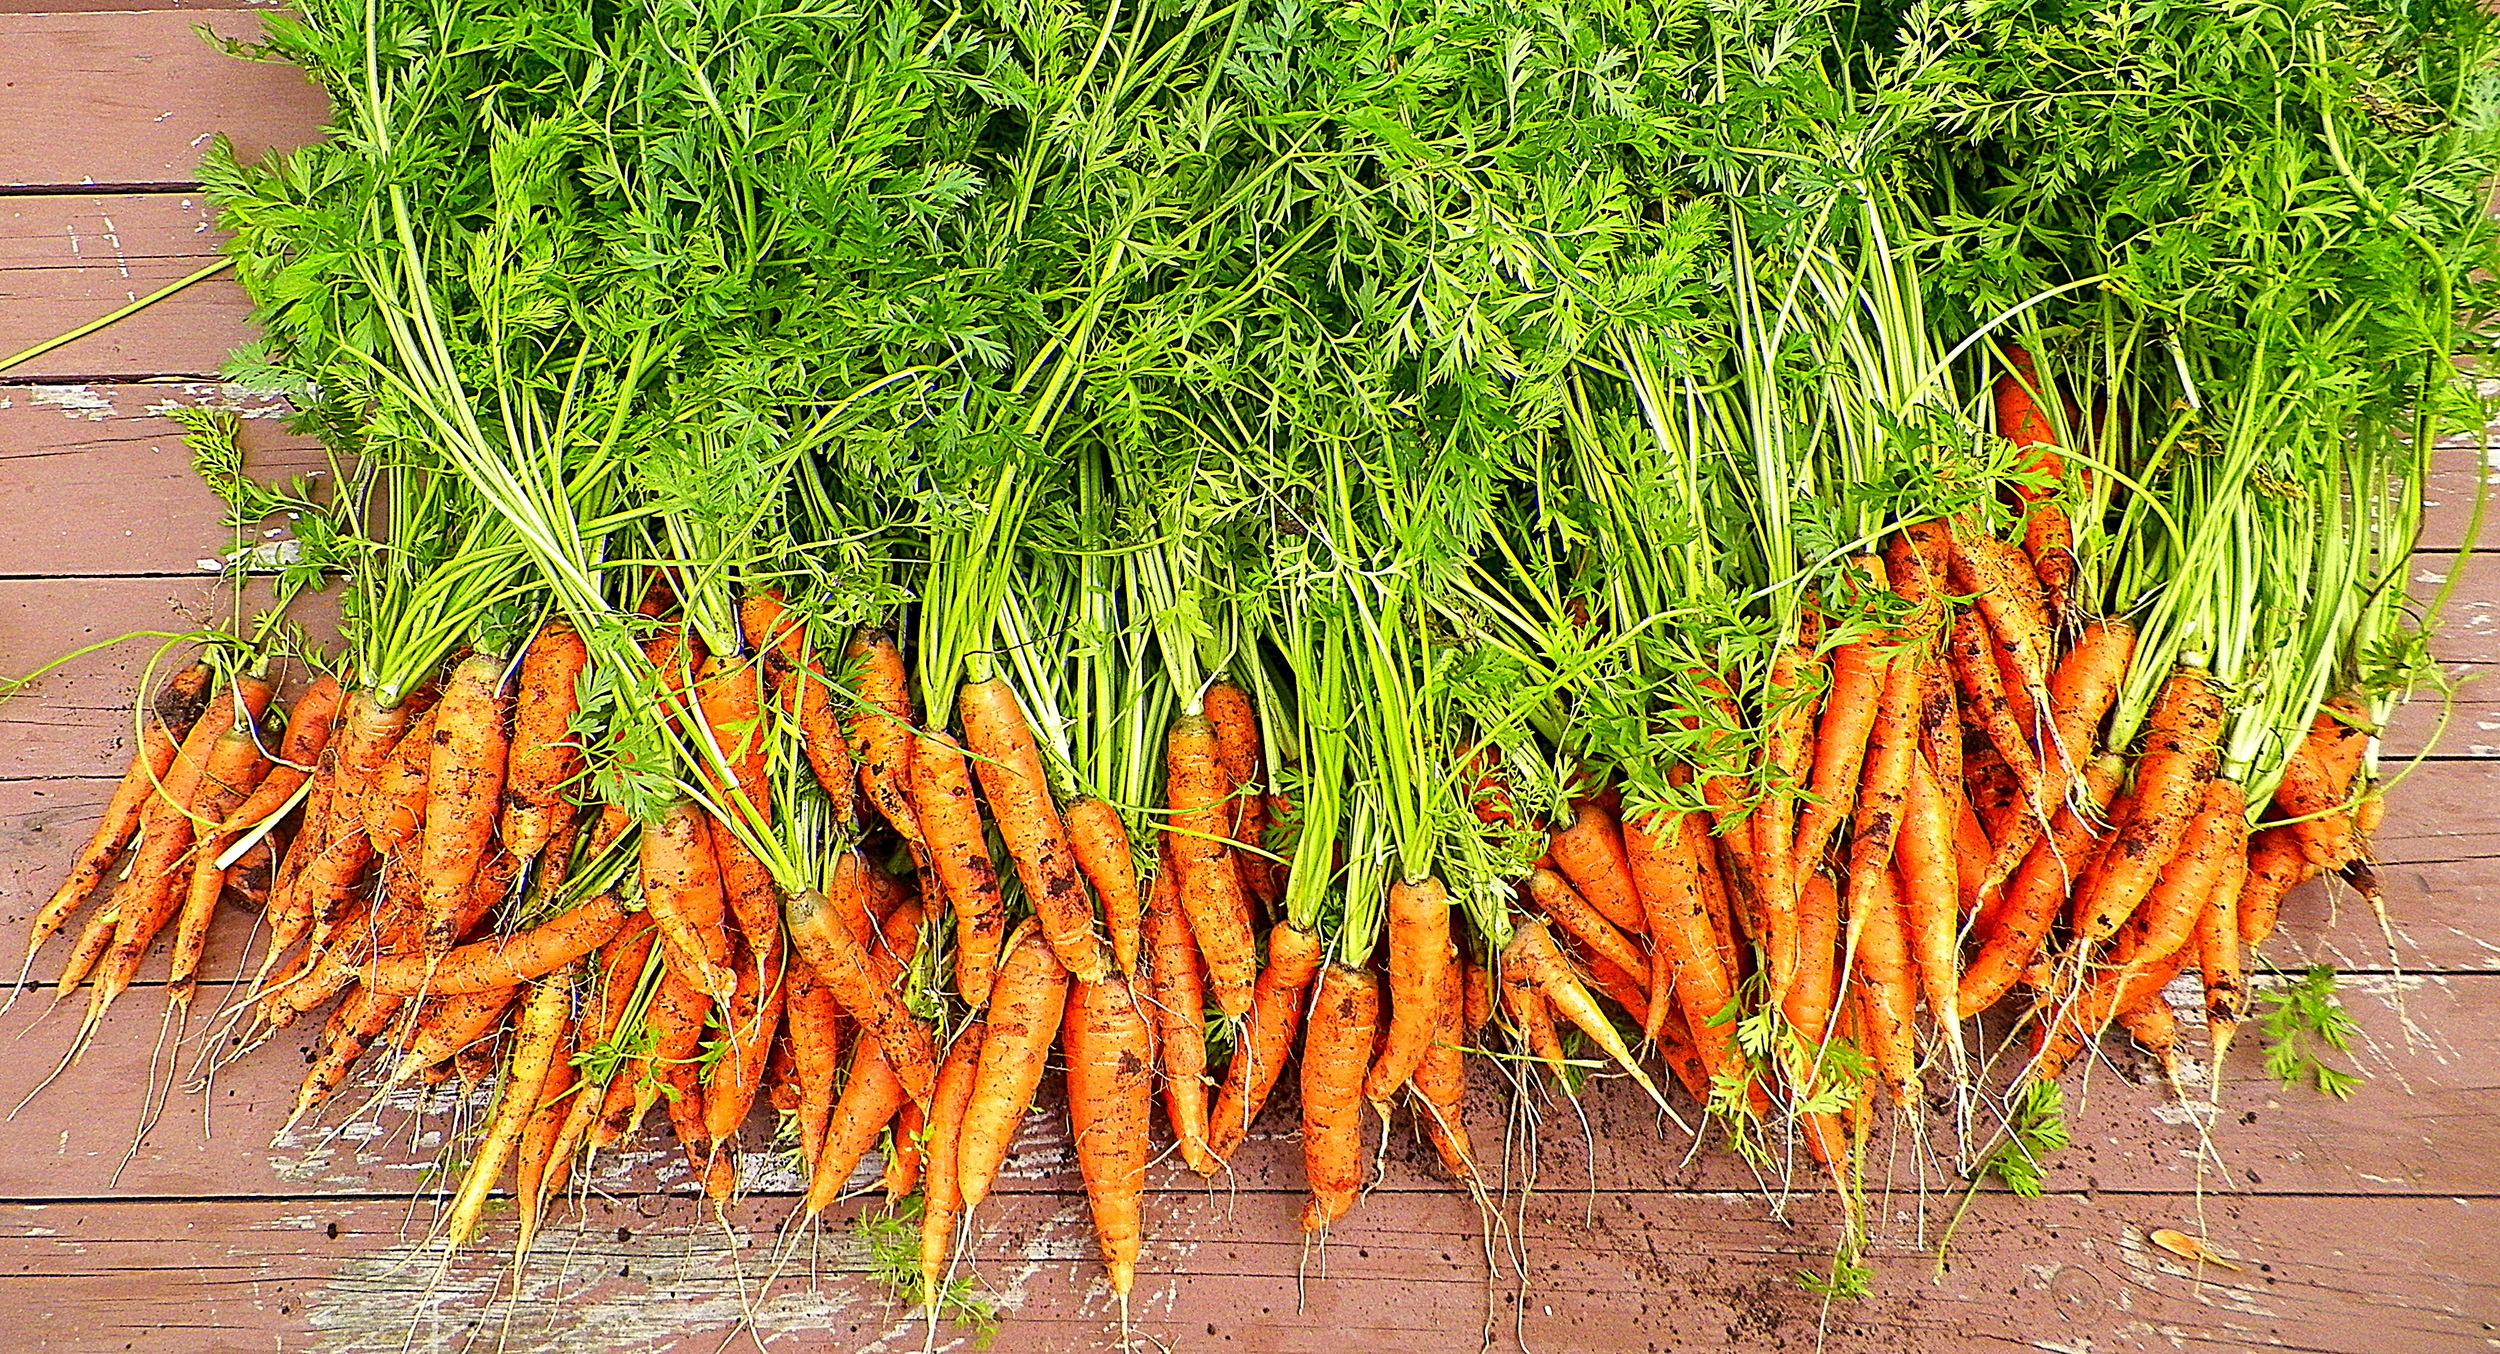 Carrots - Short&Sweet and Scarlet Nantez.